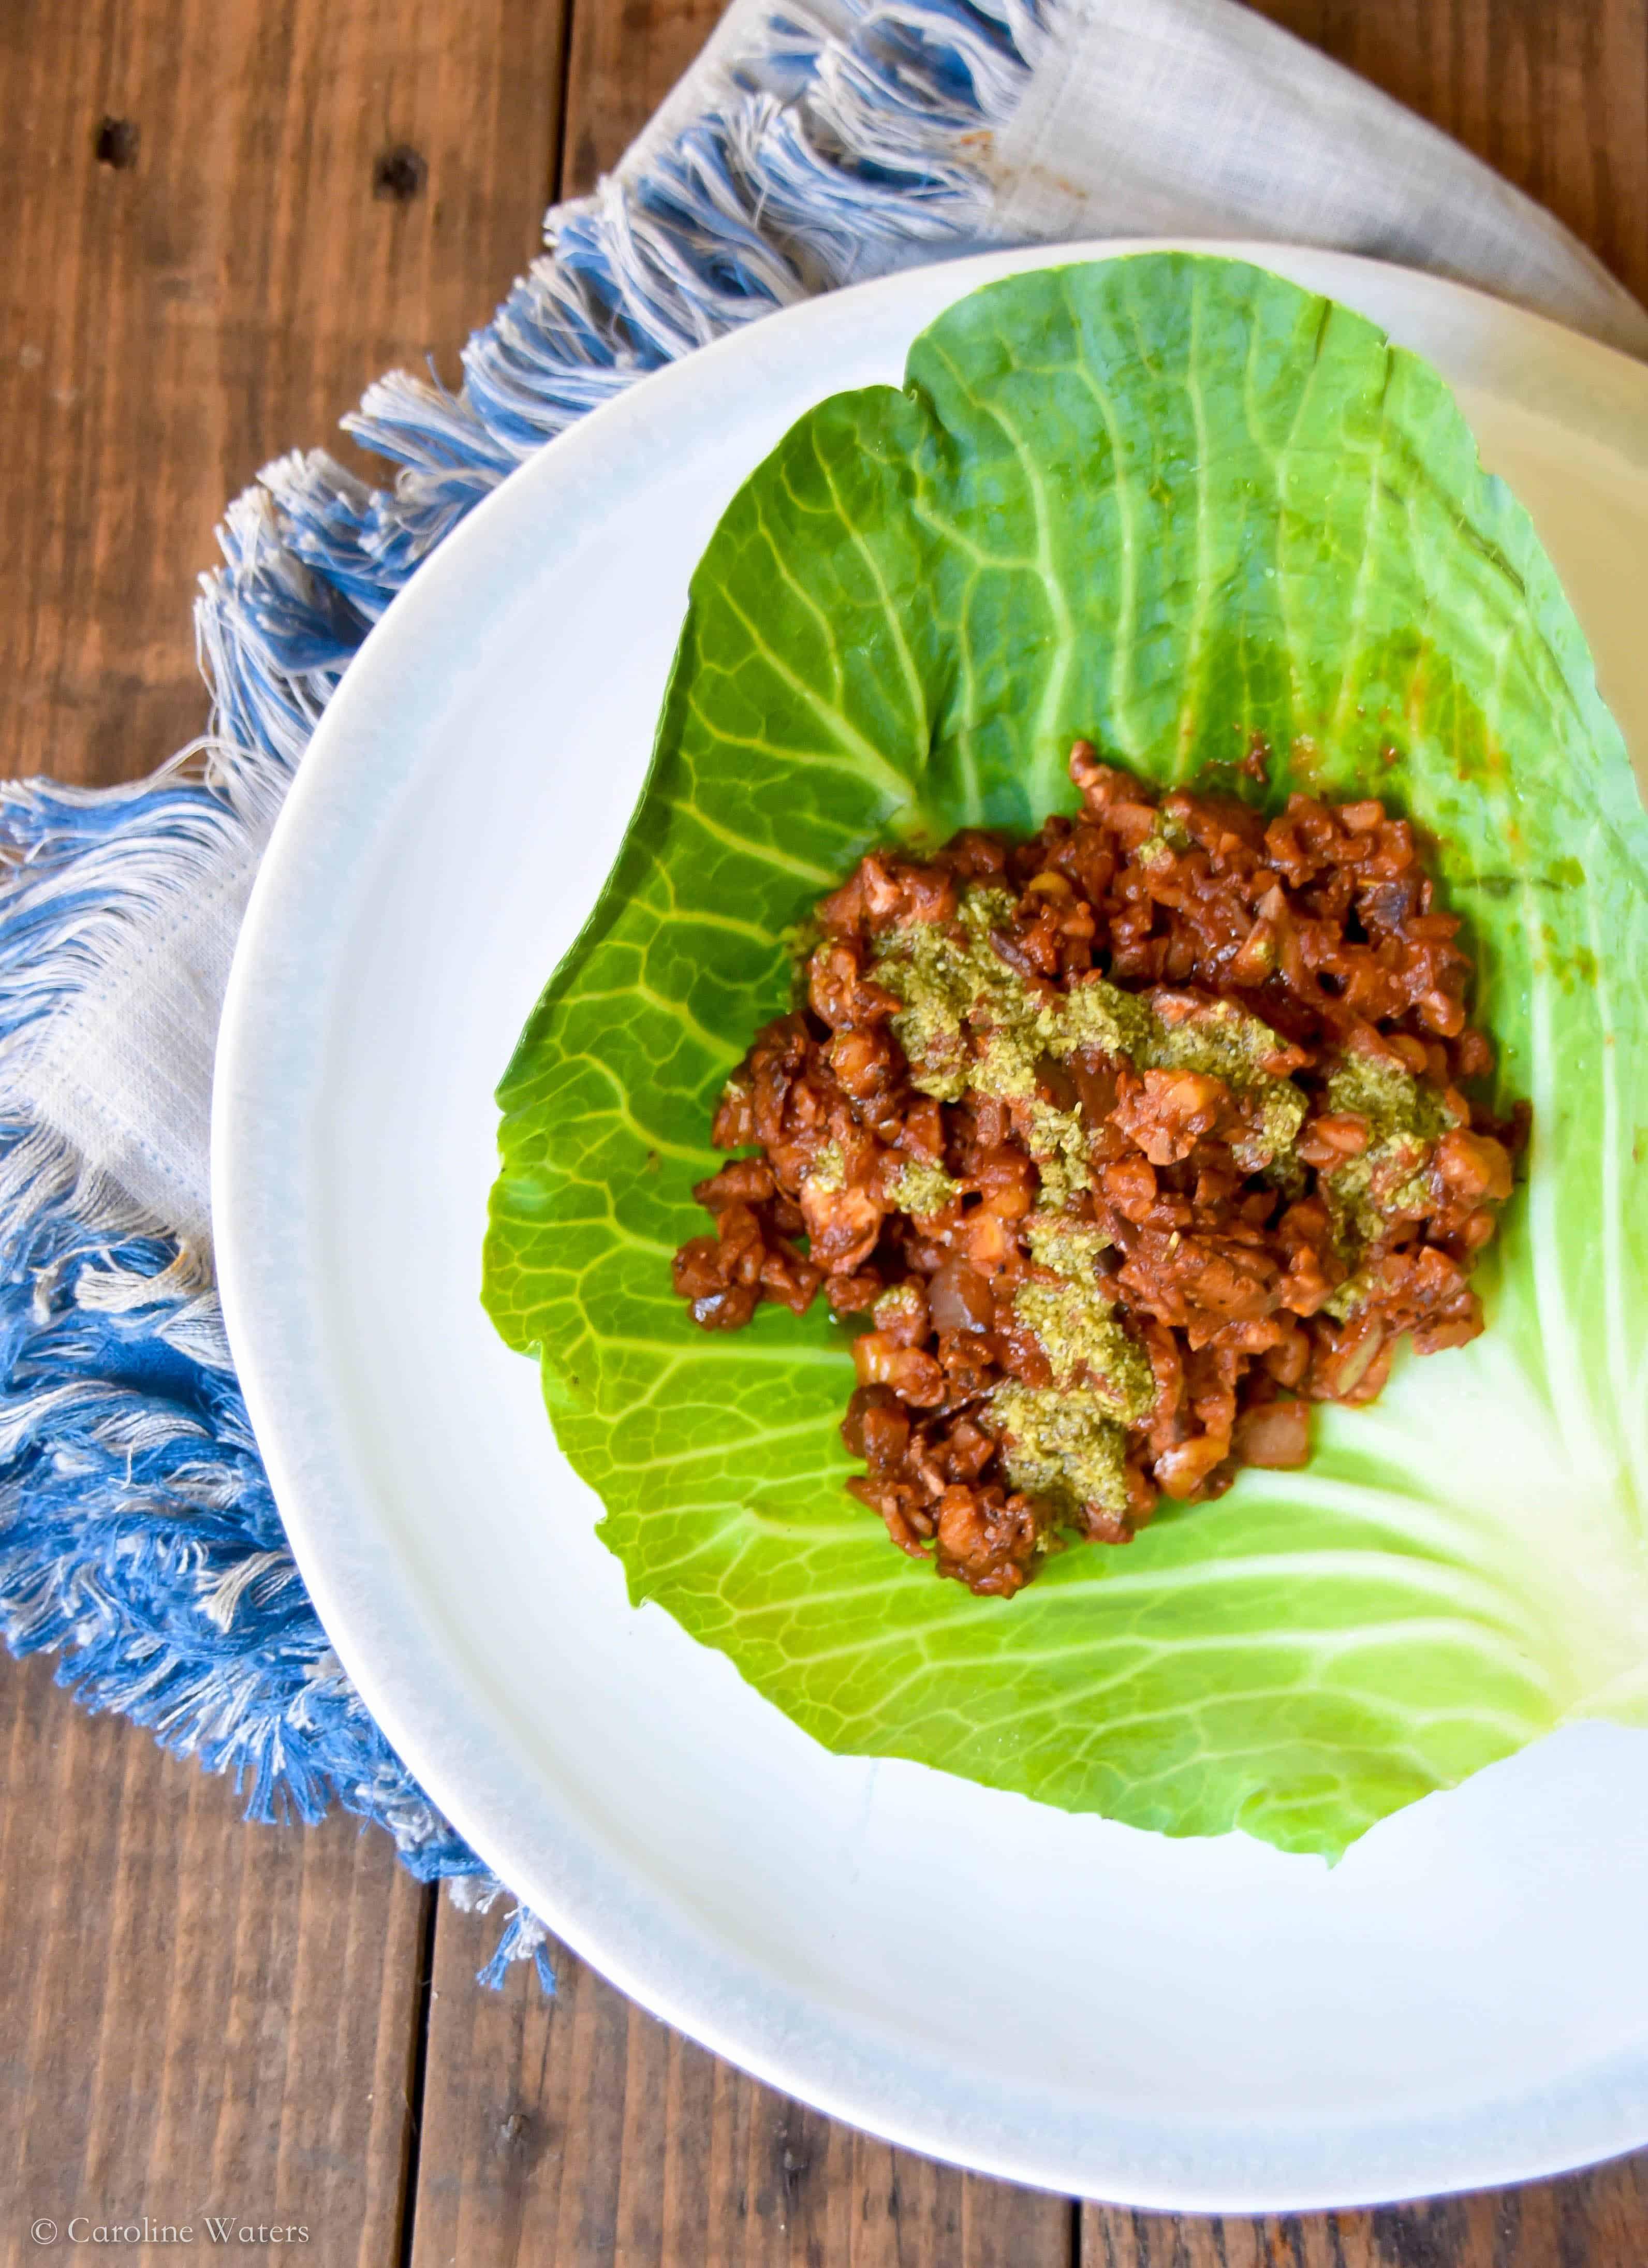 Delicious Vegan Ragout Lettuce Wraps (v)